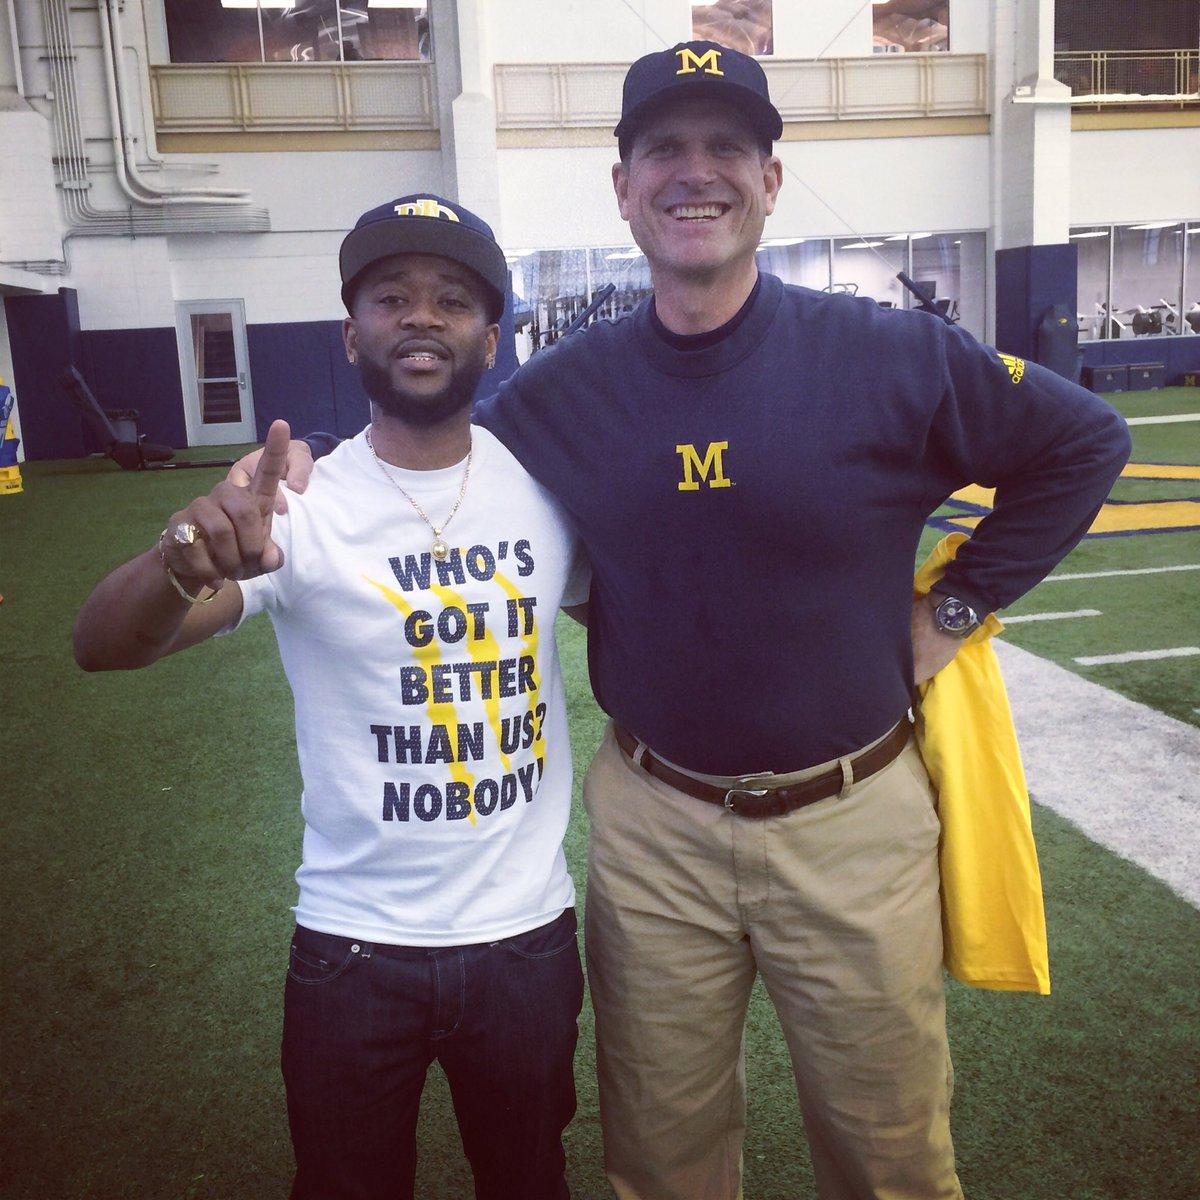 Honored to be taking it up a notch w/ @CoachJim4UM #whosgotitbetterthanus #MichiganWolverines